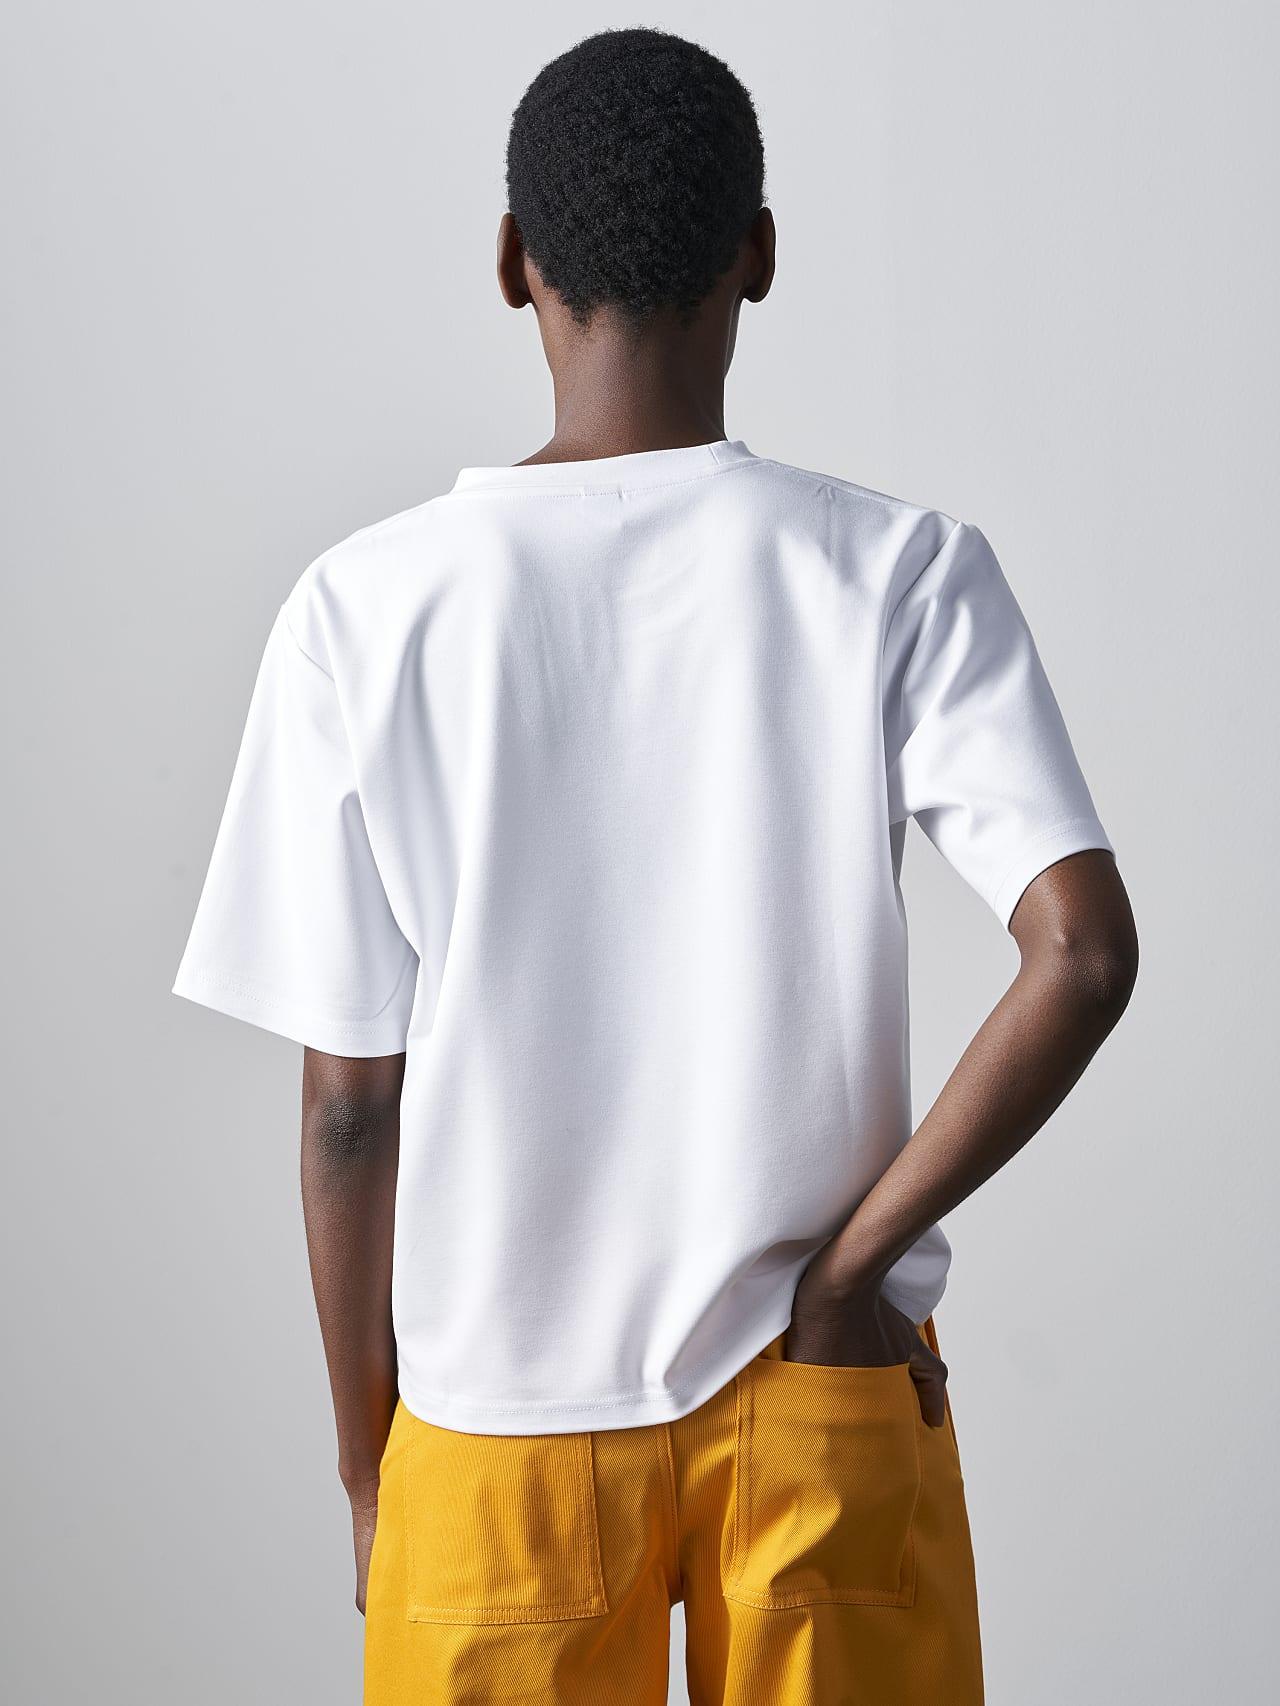 JASHU V1.Y5.02 Heavy-Weight Logo T-Shirt white scene7.view.9.name Alpha Tauri